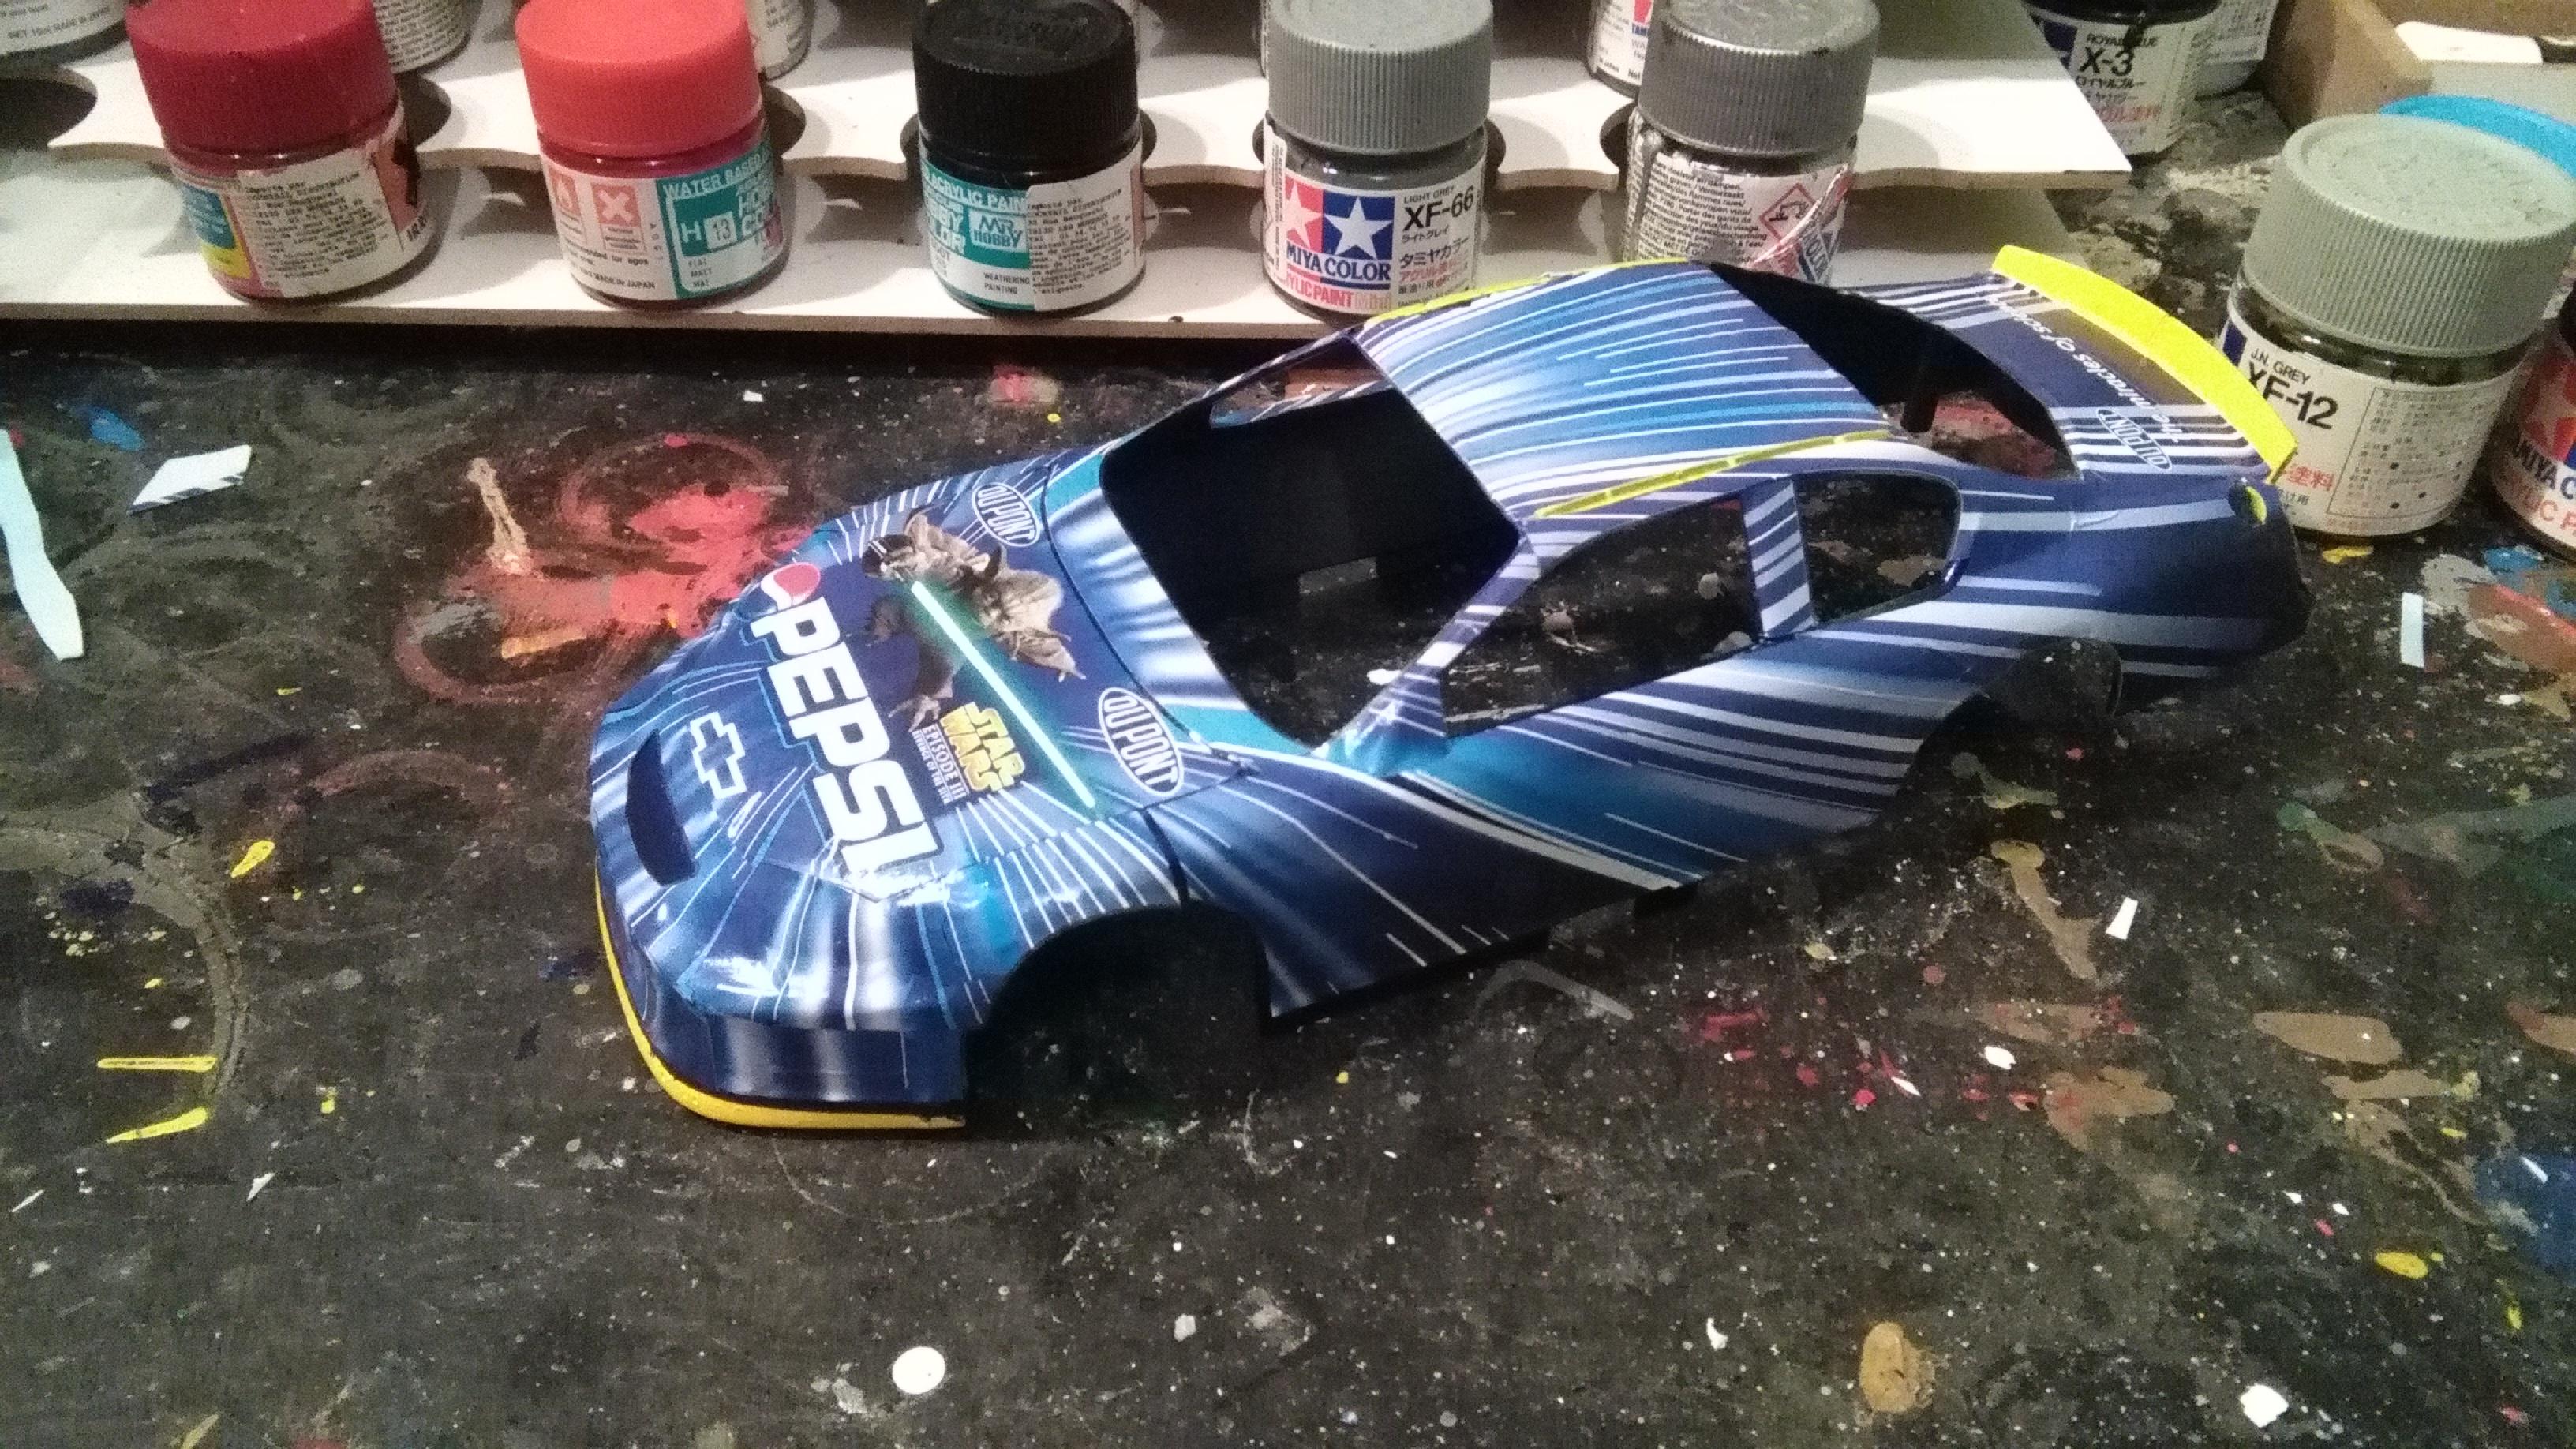 Chevy Monte-Carlo 2005 #24 Jeff Gordon Pepsi/Star Wars  770964IMG20170428214220